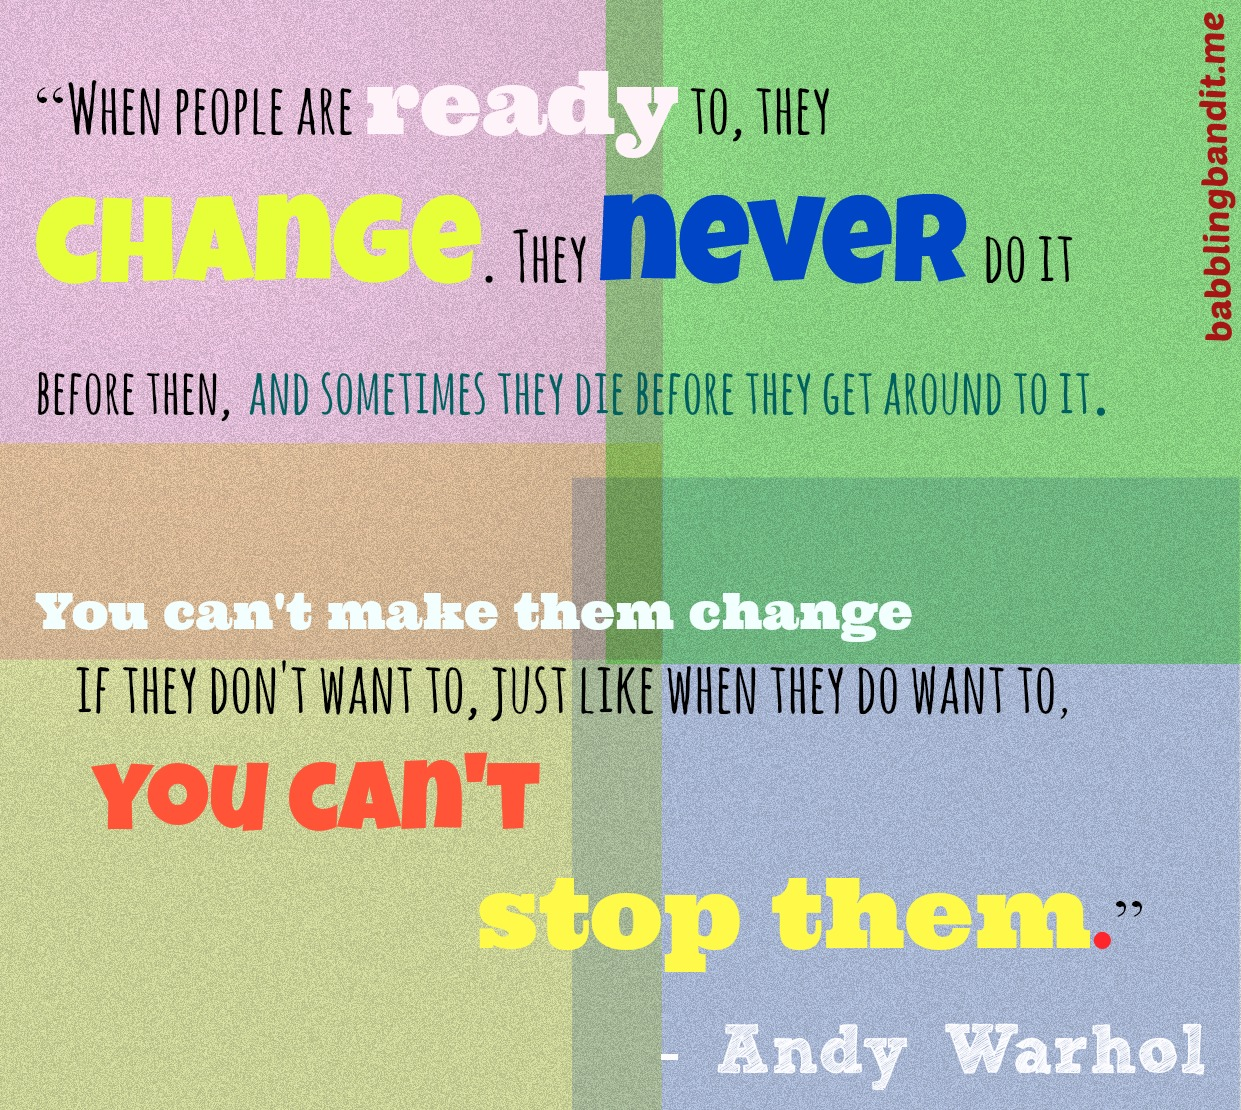 positive change quotes quotesgram